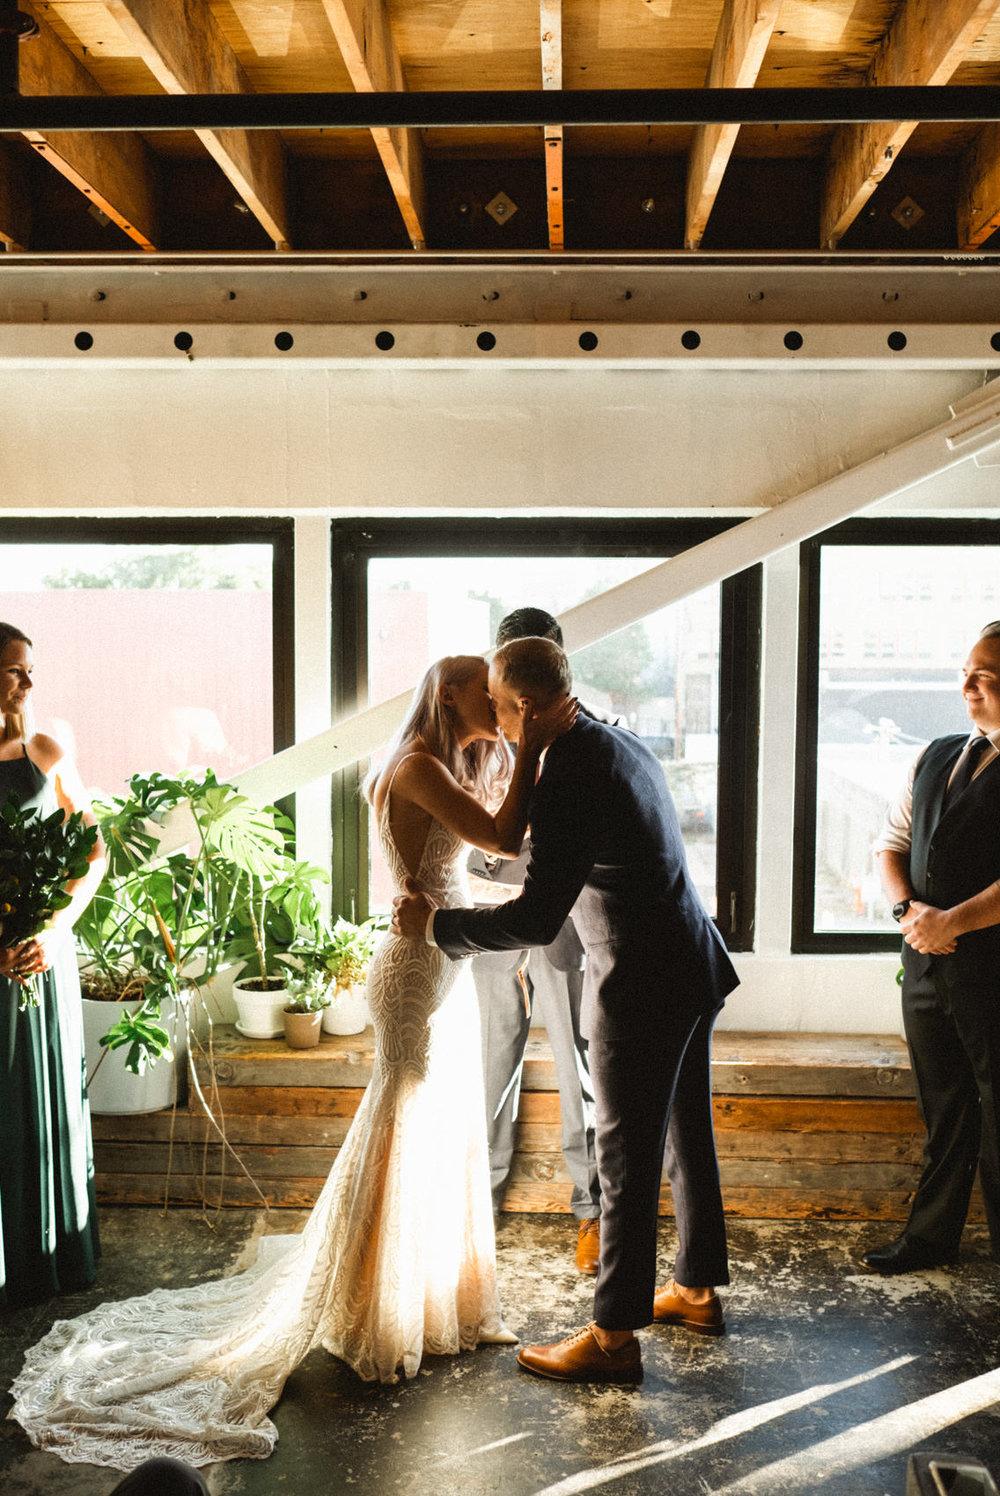 union-pine-portland-loft-wedding-045.jpg